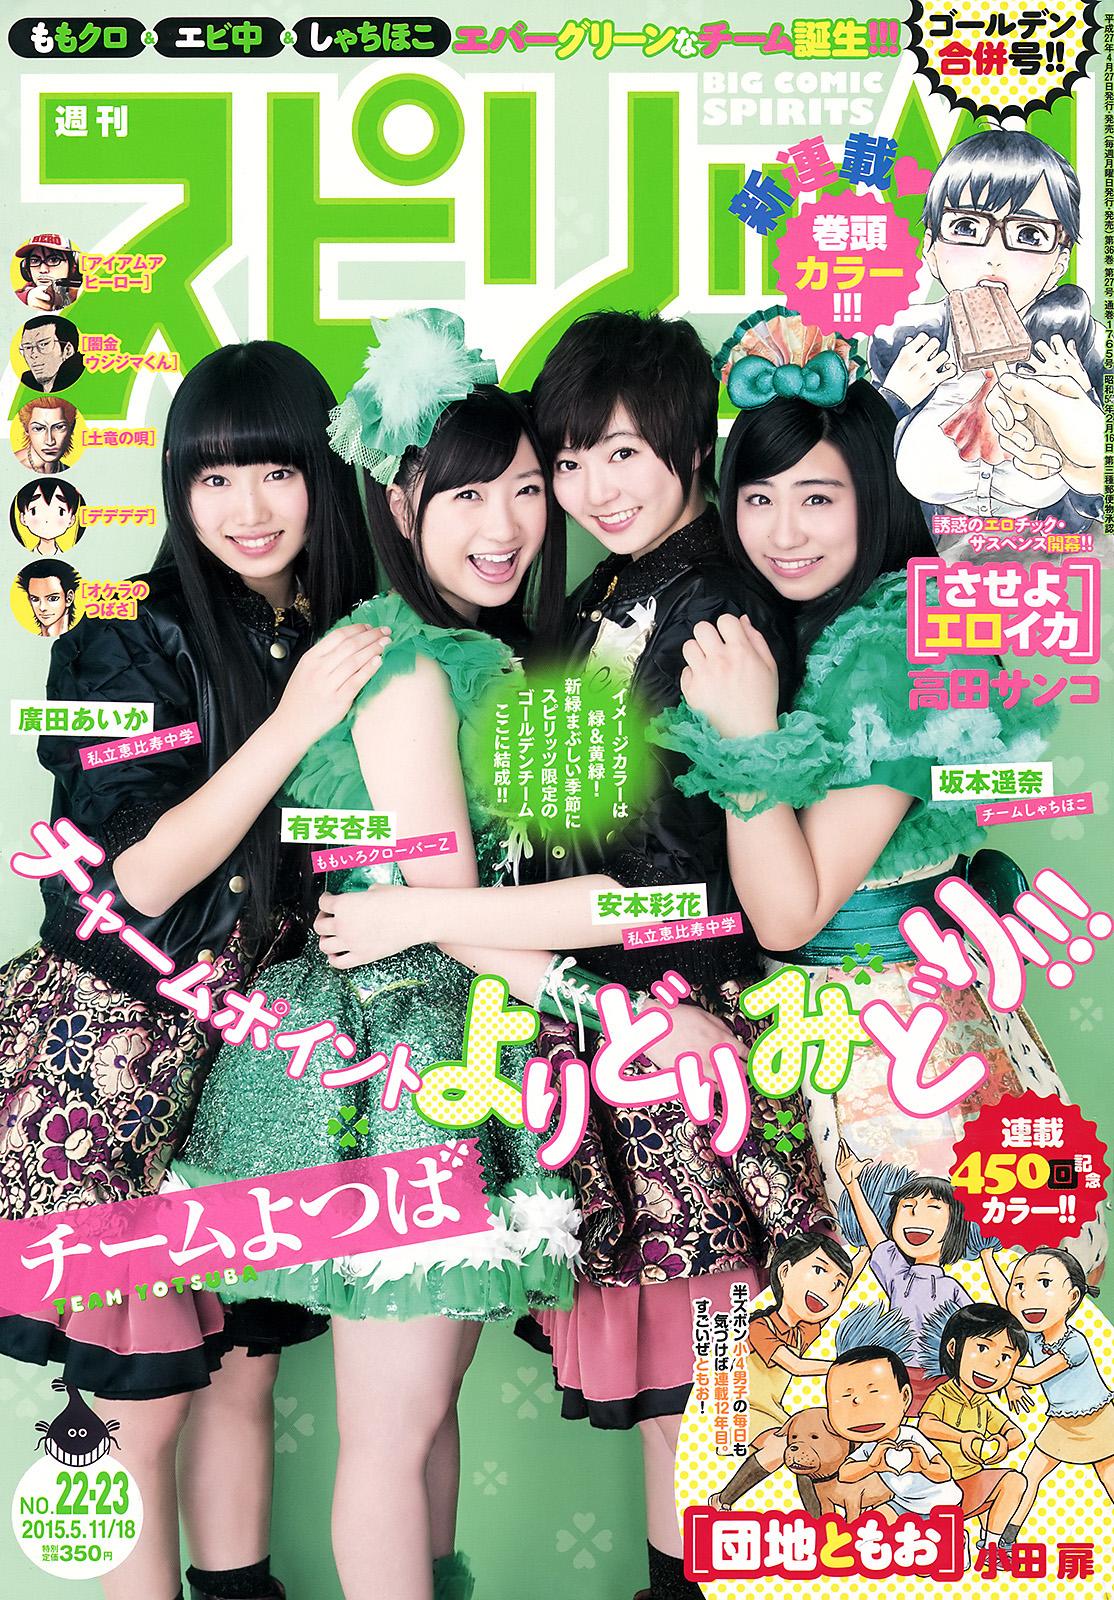 [Big Comic Spirits] No.22-23 安本彩花 有安杏果 坂本遥奈 廣田あいか [2015] [5.6MB]